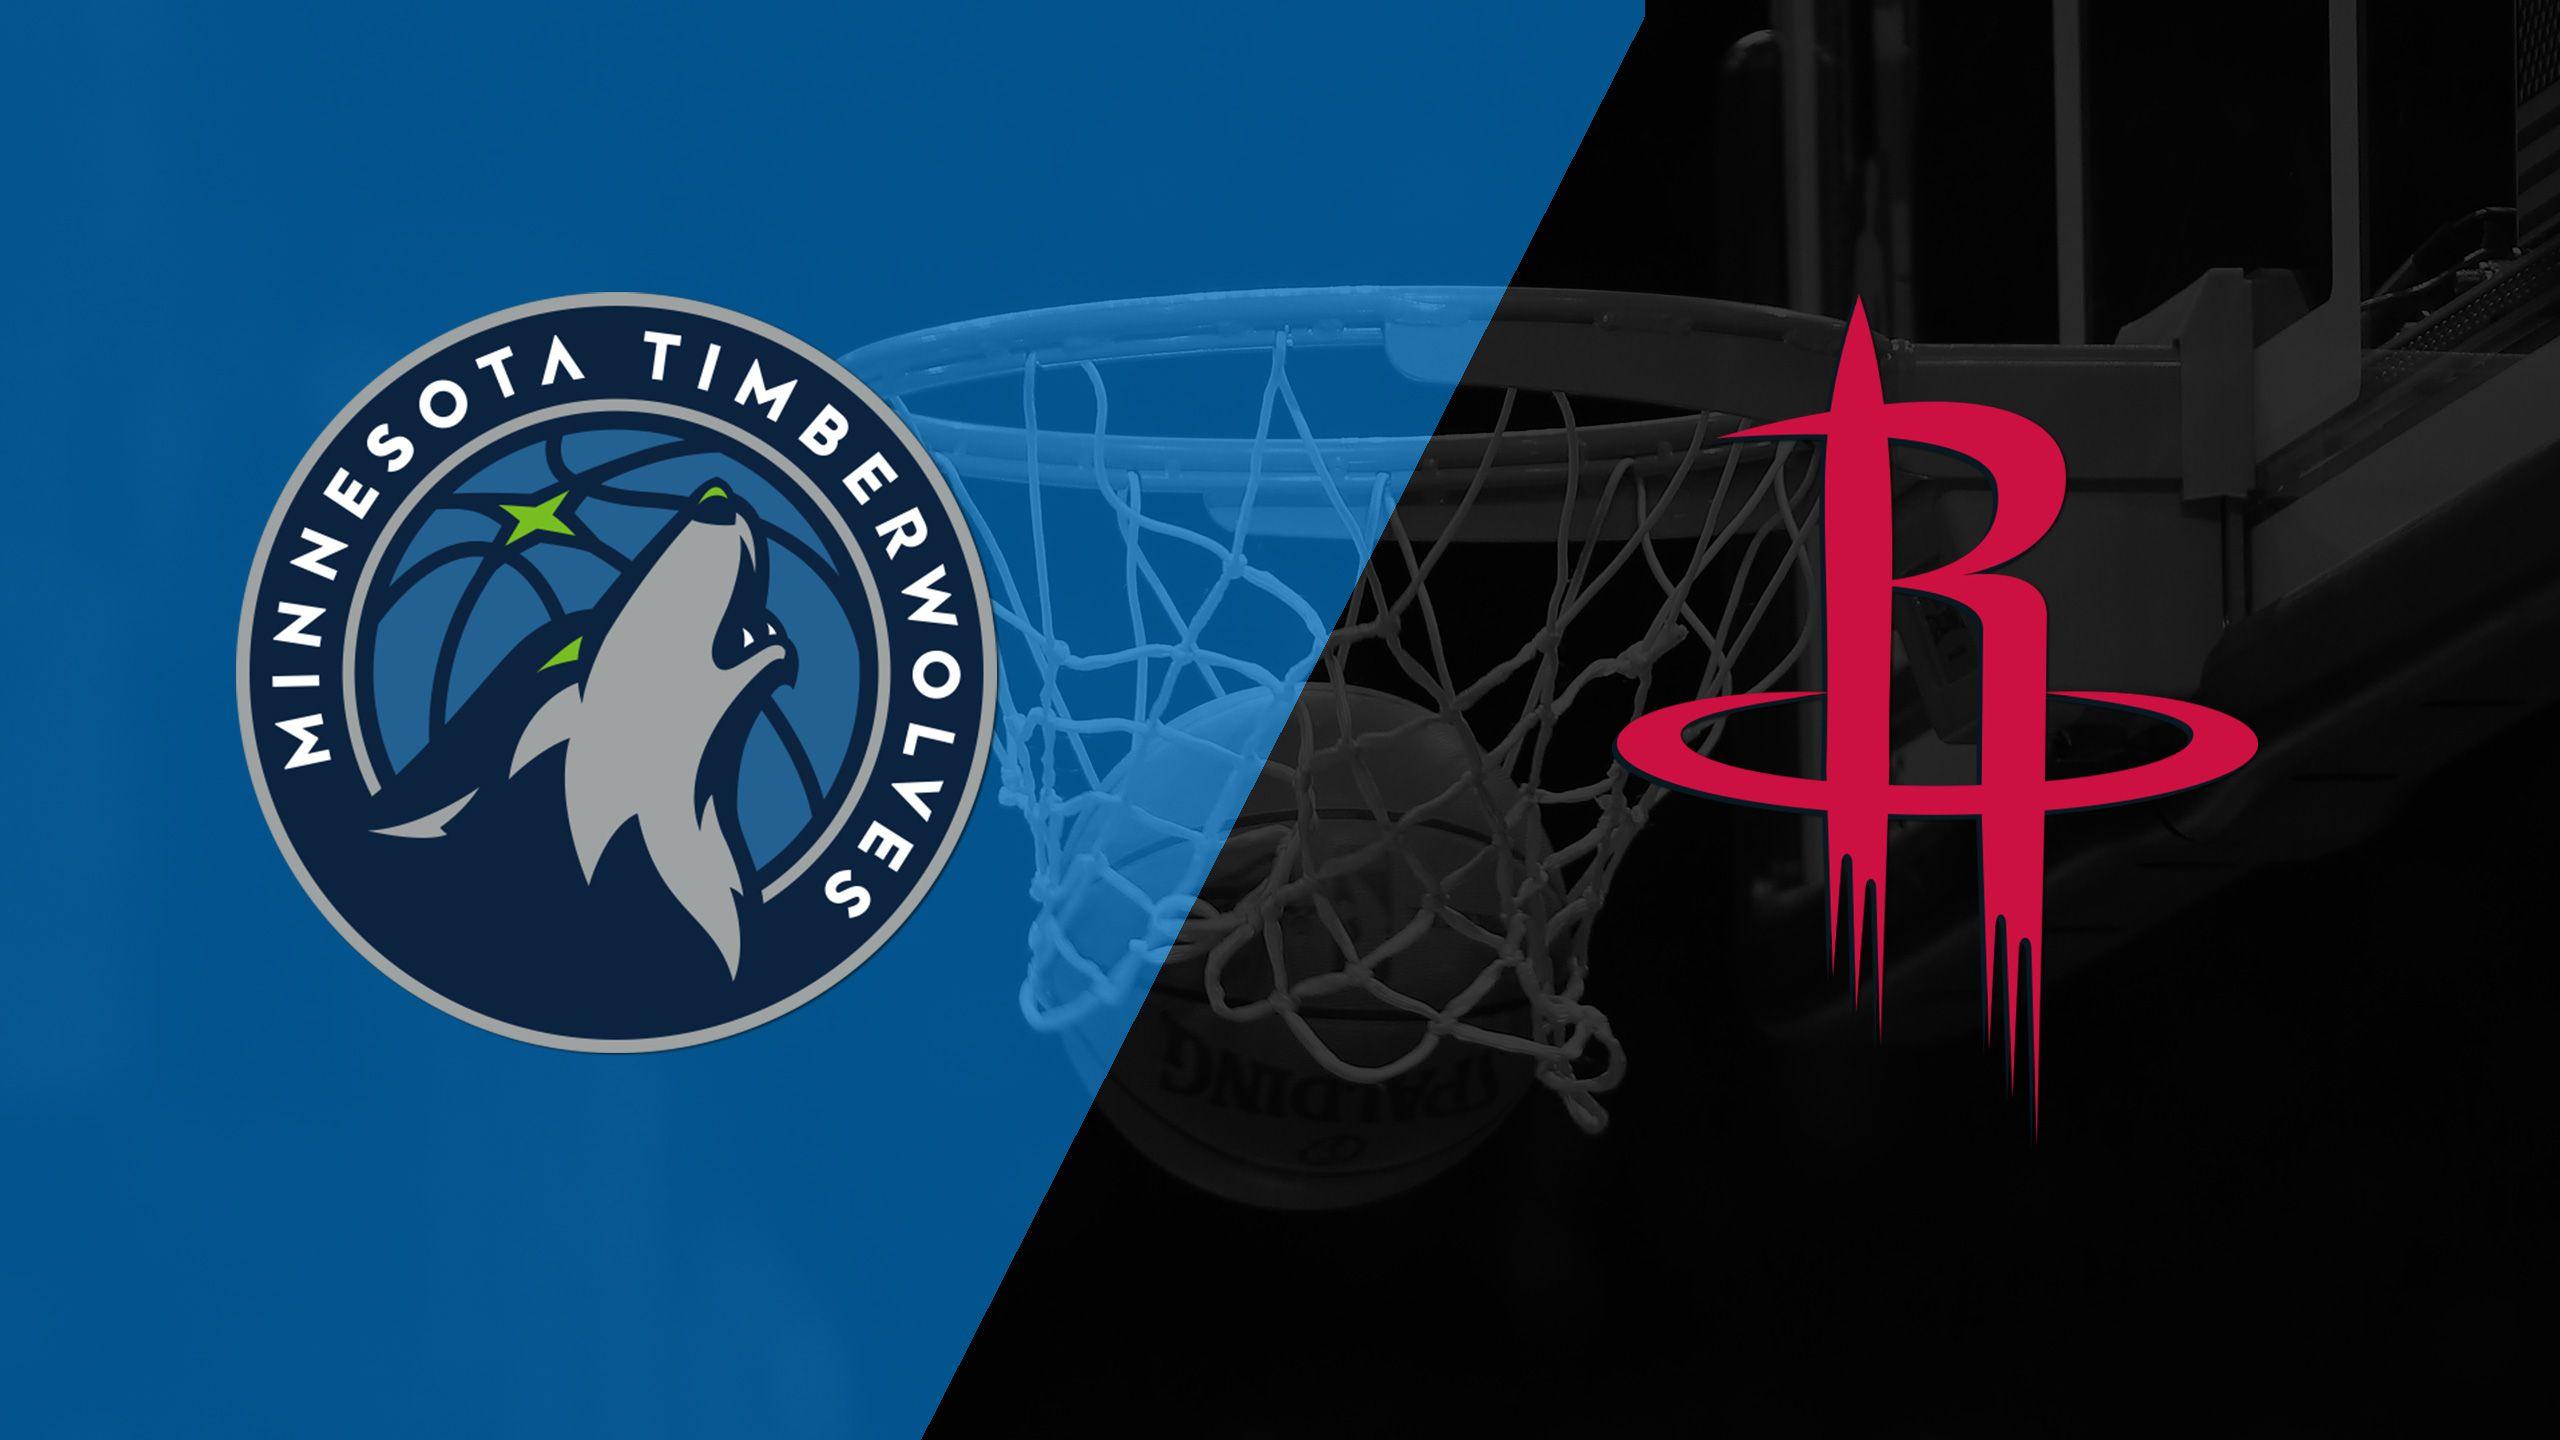 In Spanish - Minnesota Timberwolves vs. Houston Rockets